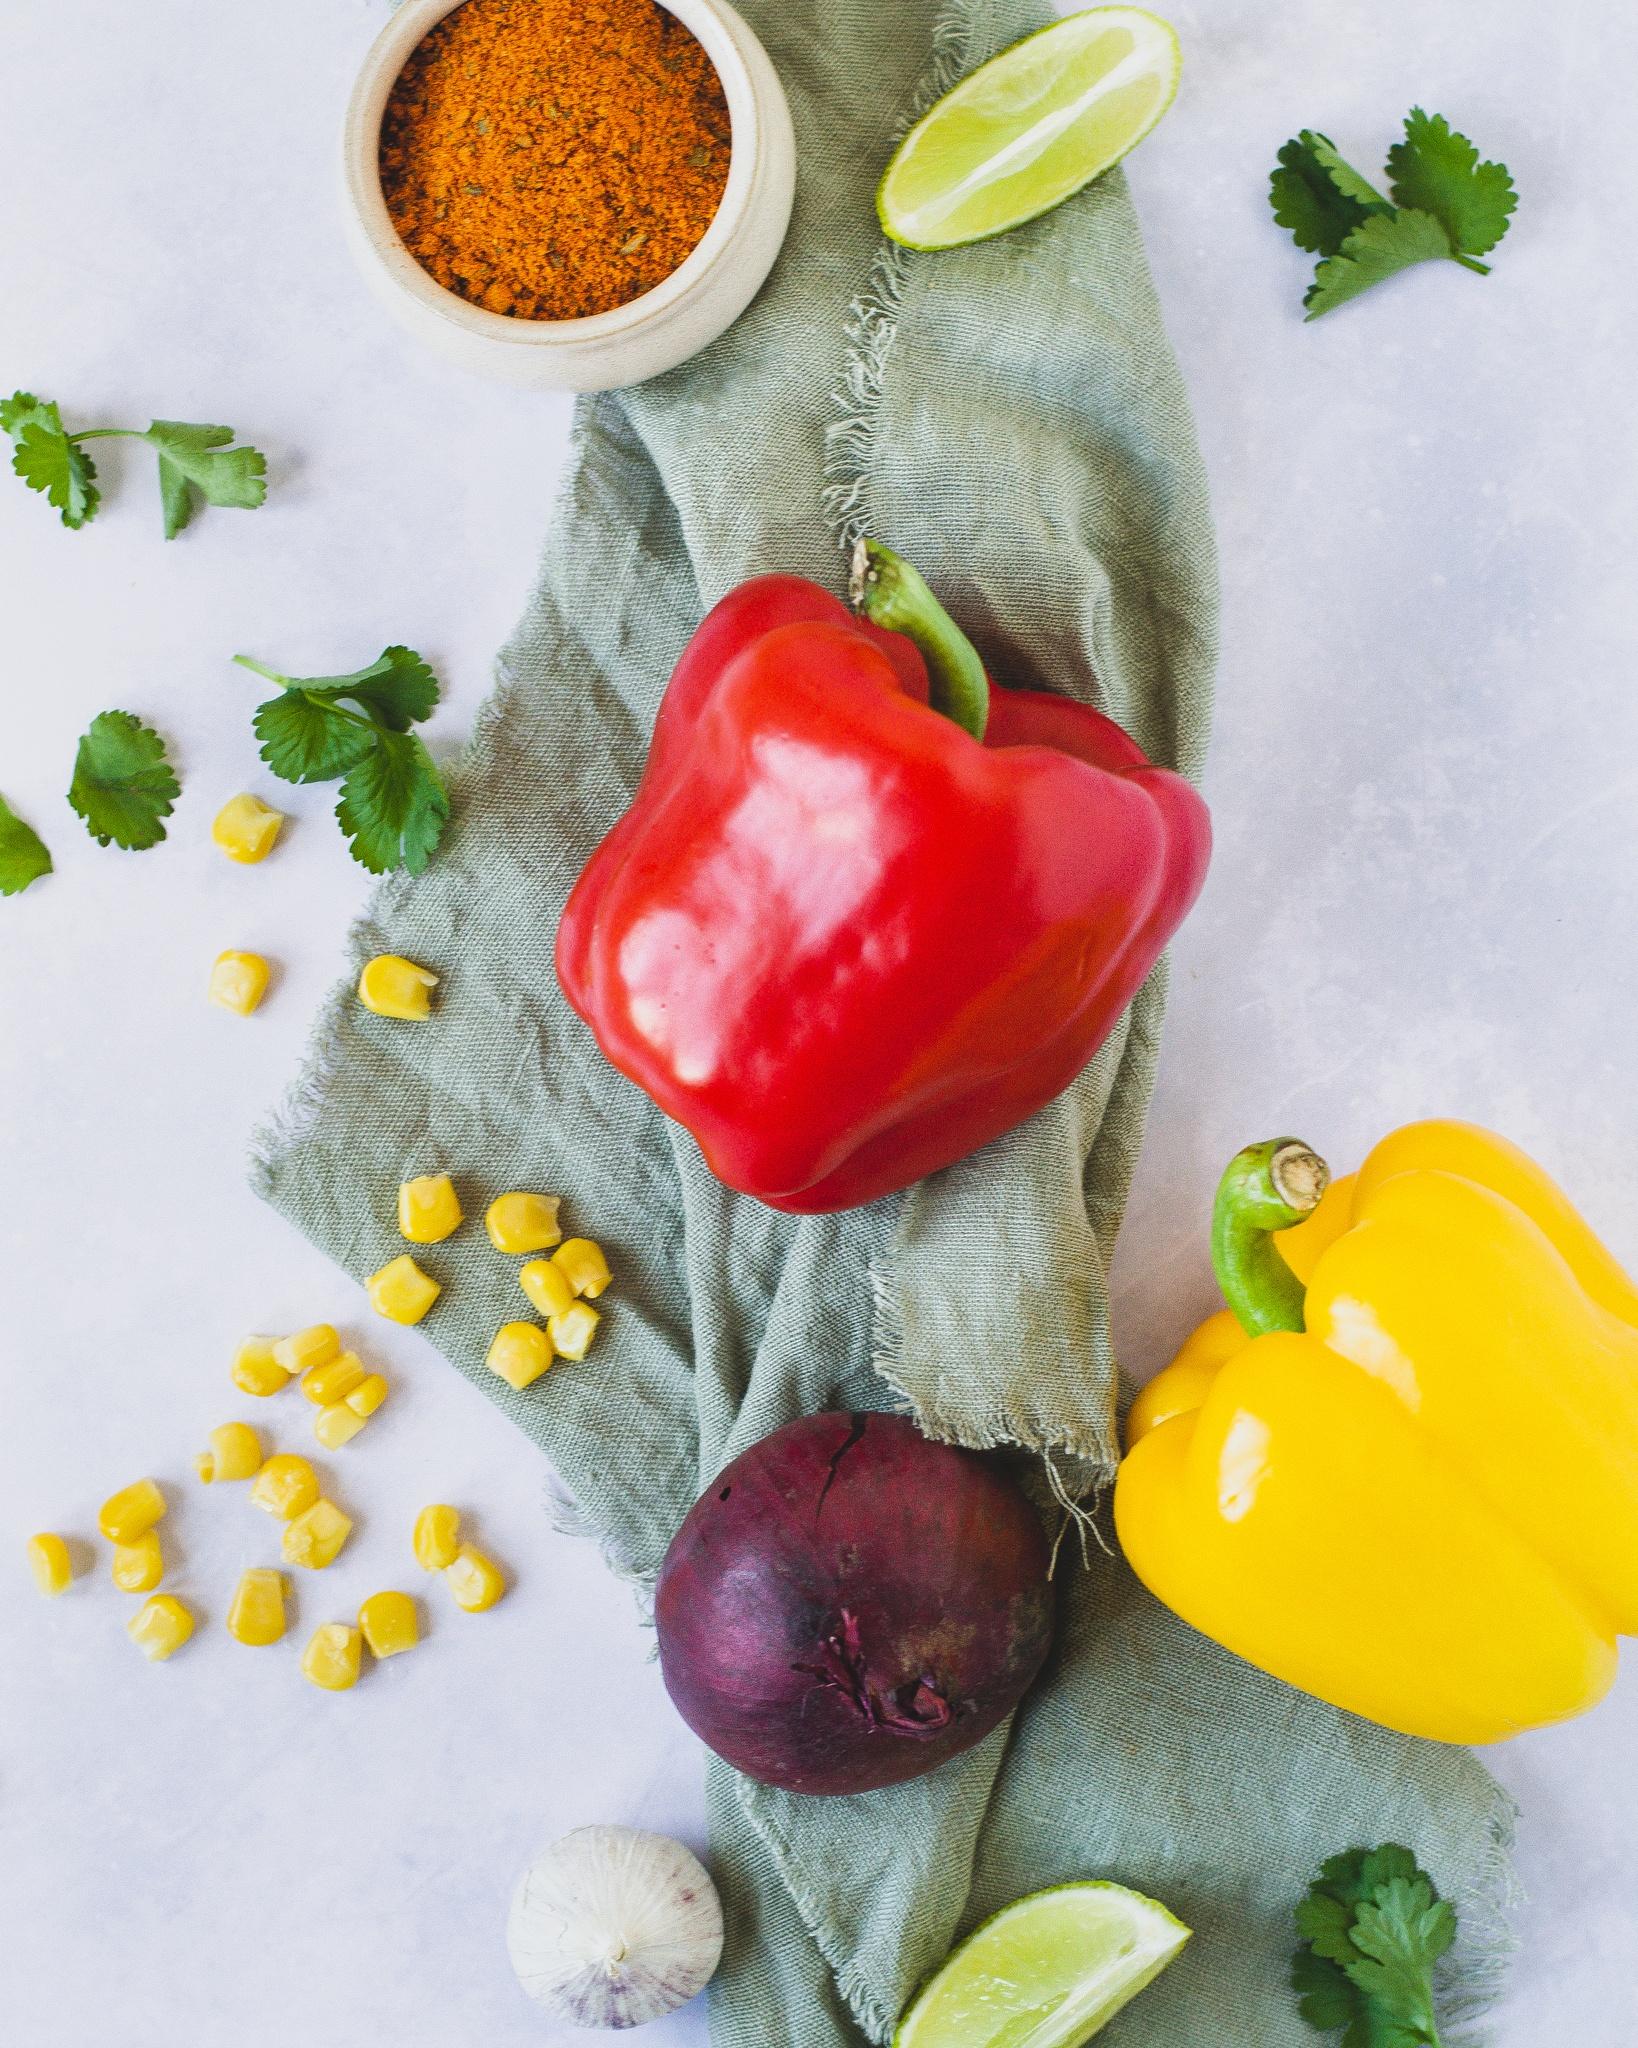 Råvarer til kylling fajita. Peberfrugt, lime, rødløg, majs, koriander og fajitakrydderi.